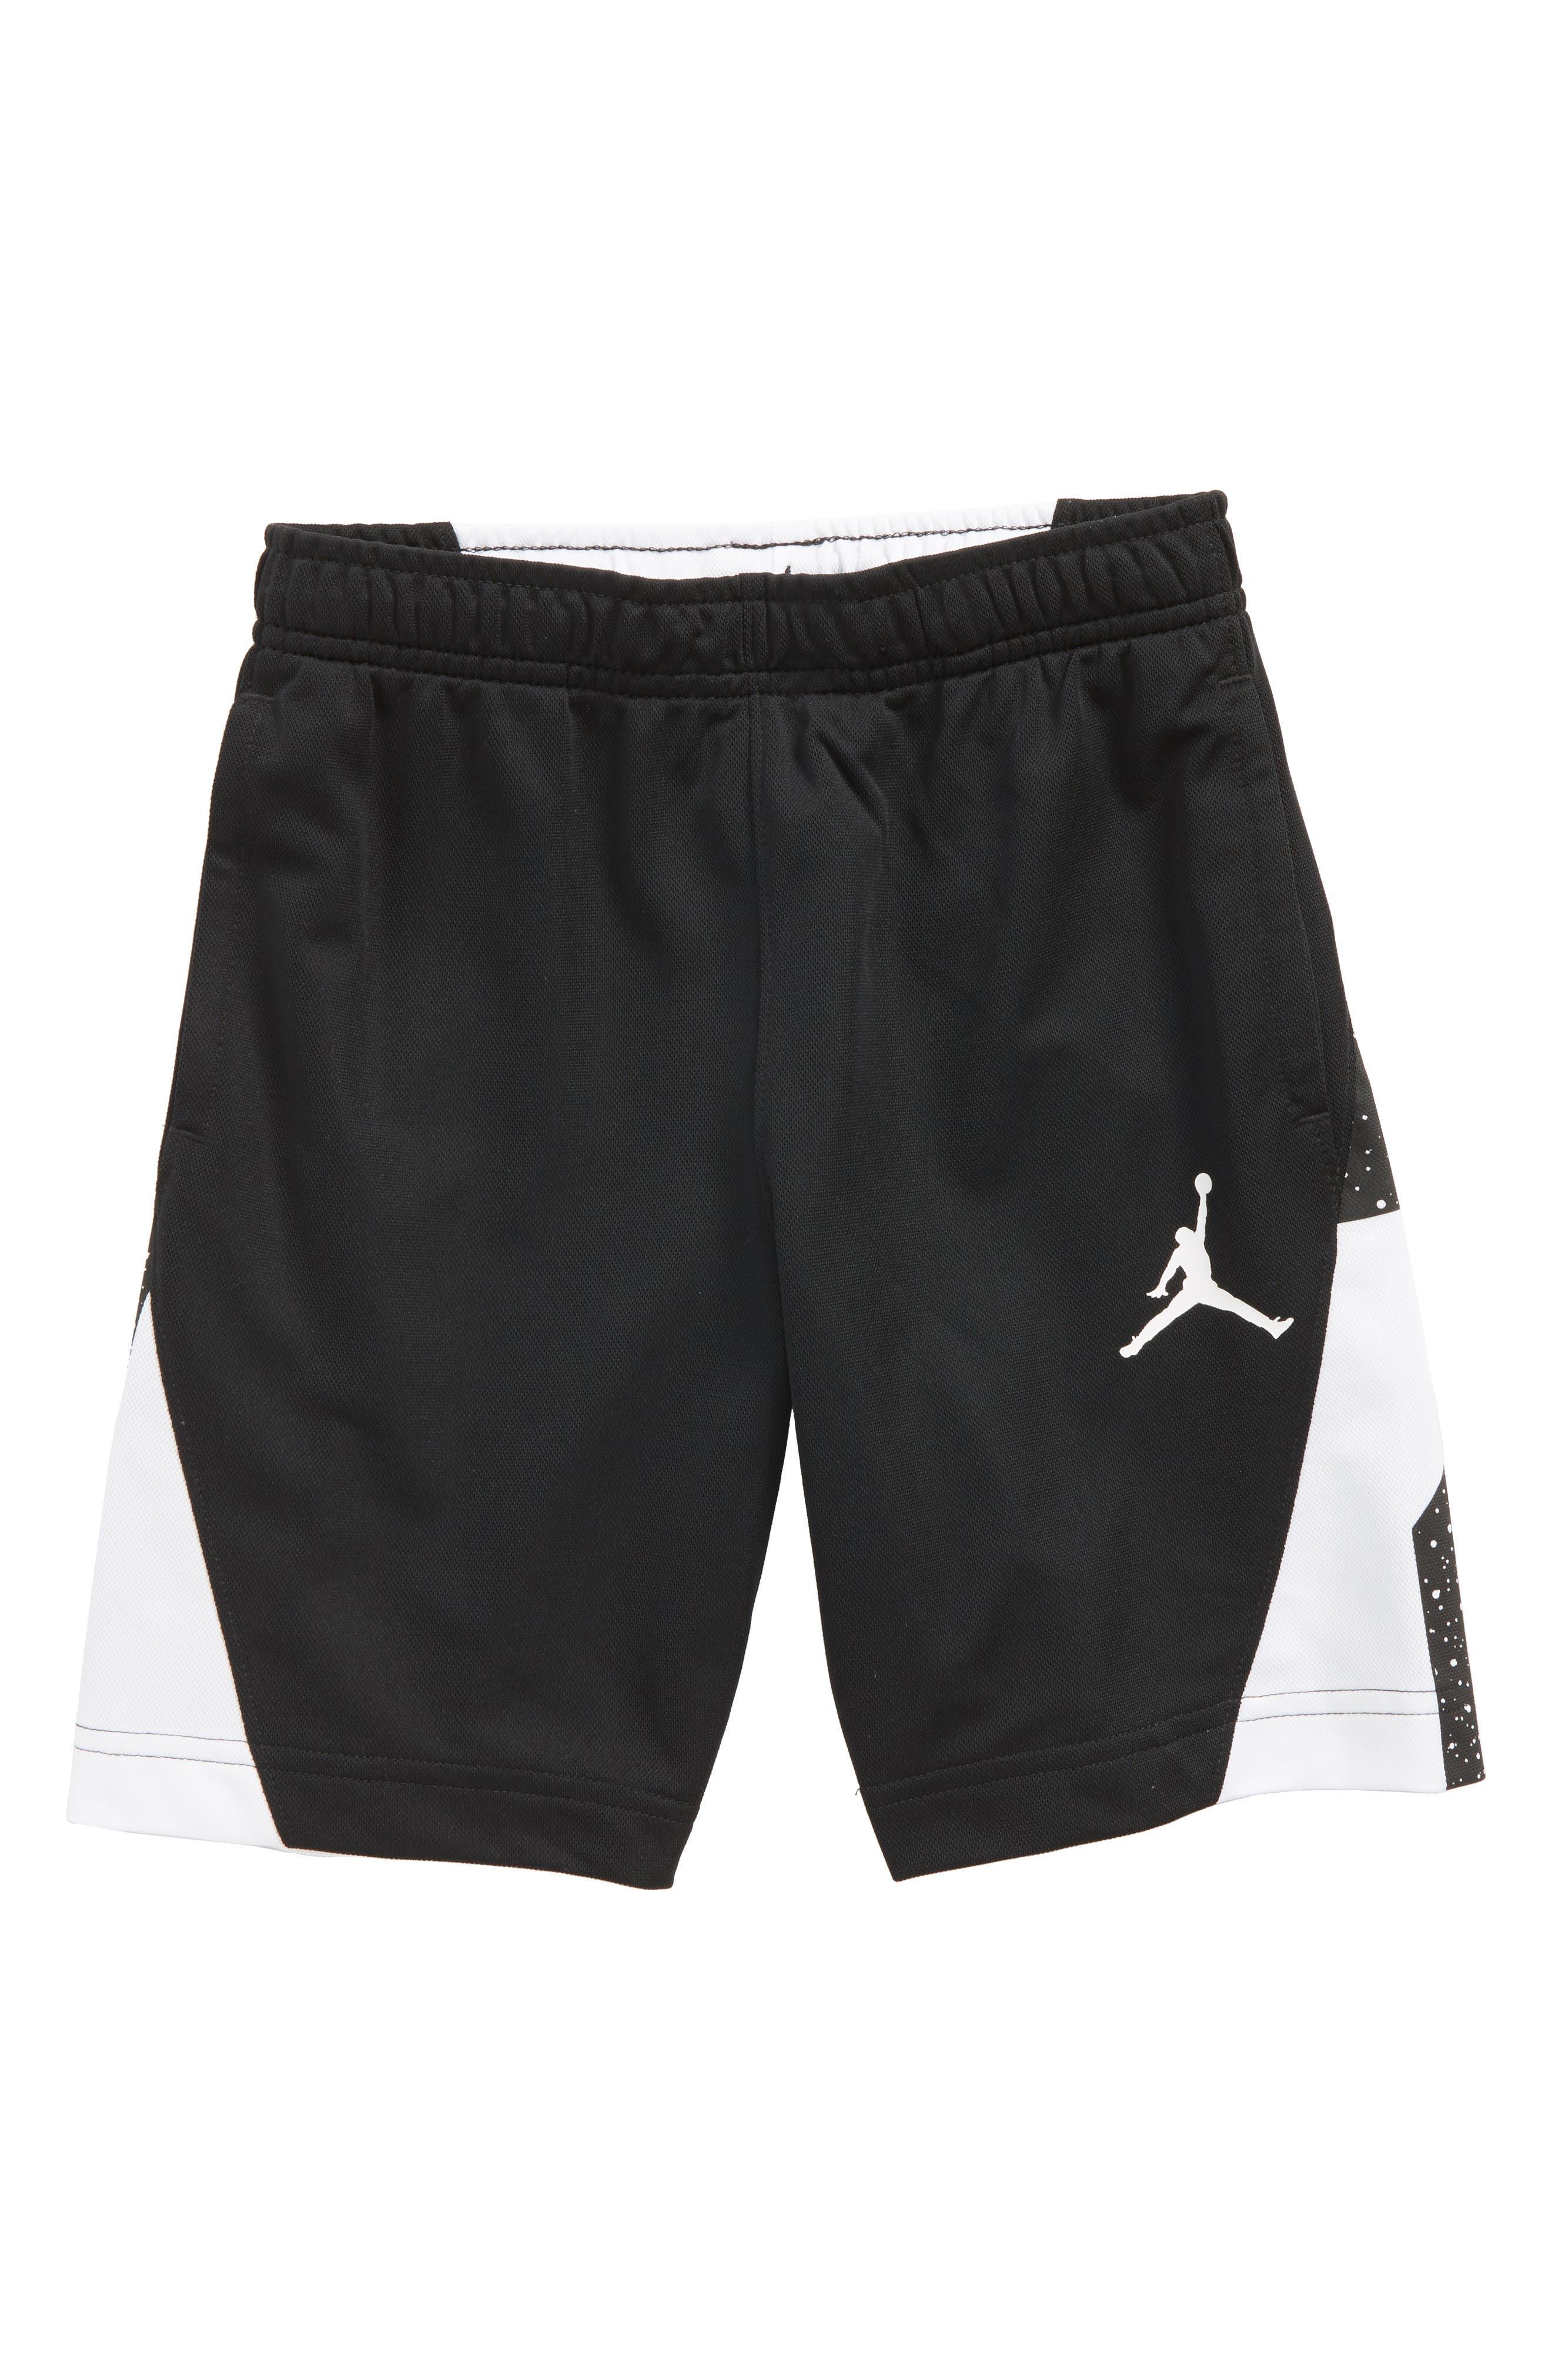 Jordan Dry Speckle 23 Training Shorts,                         Main,                         color, 001